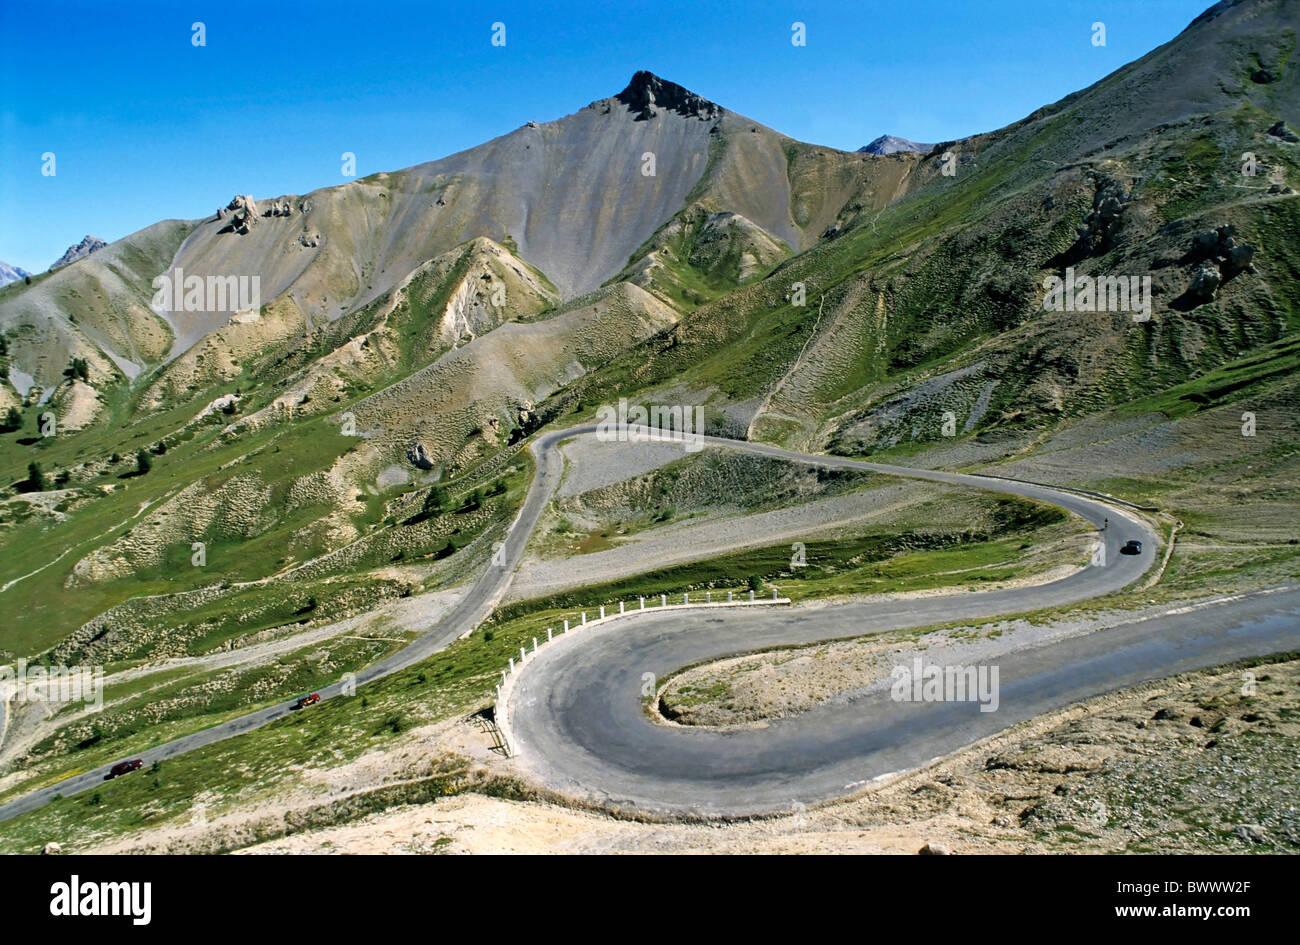 Alpes, Provence, France, le célèbre col d'Izoard / Izoard Pass mountain road Photo Stock